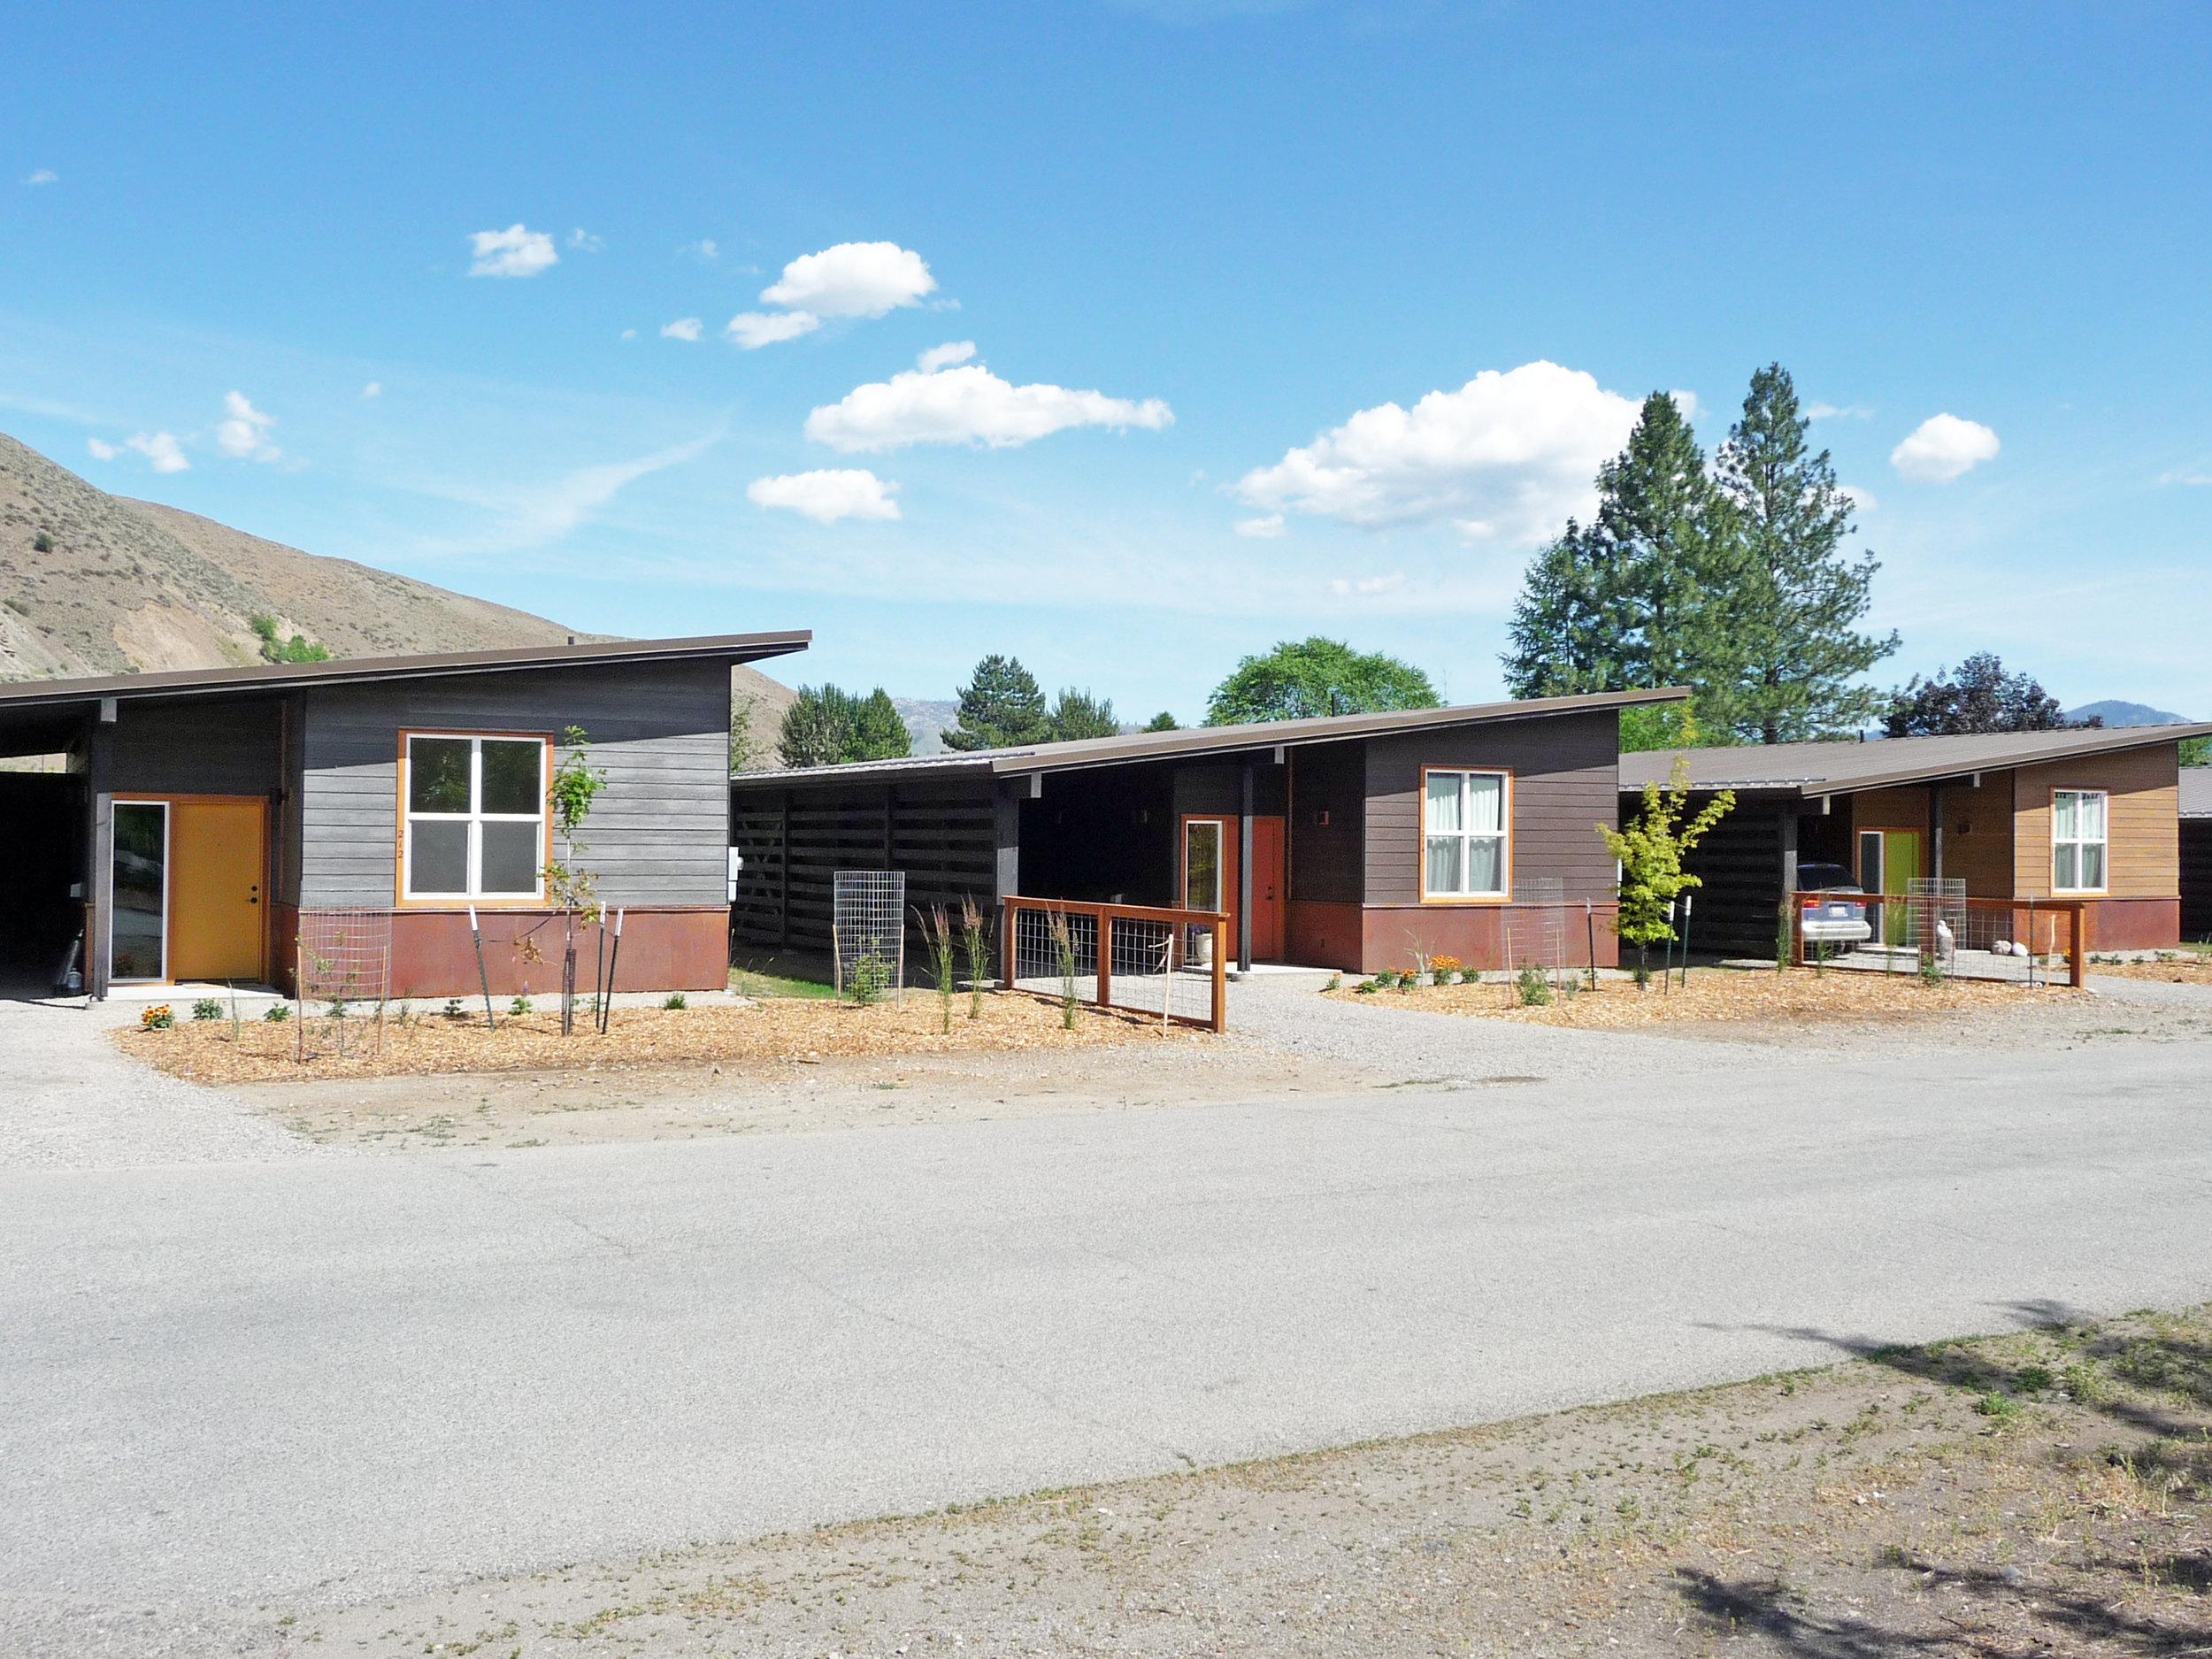 homes 3 4 and 5 canyon street.jpg